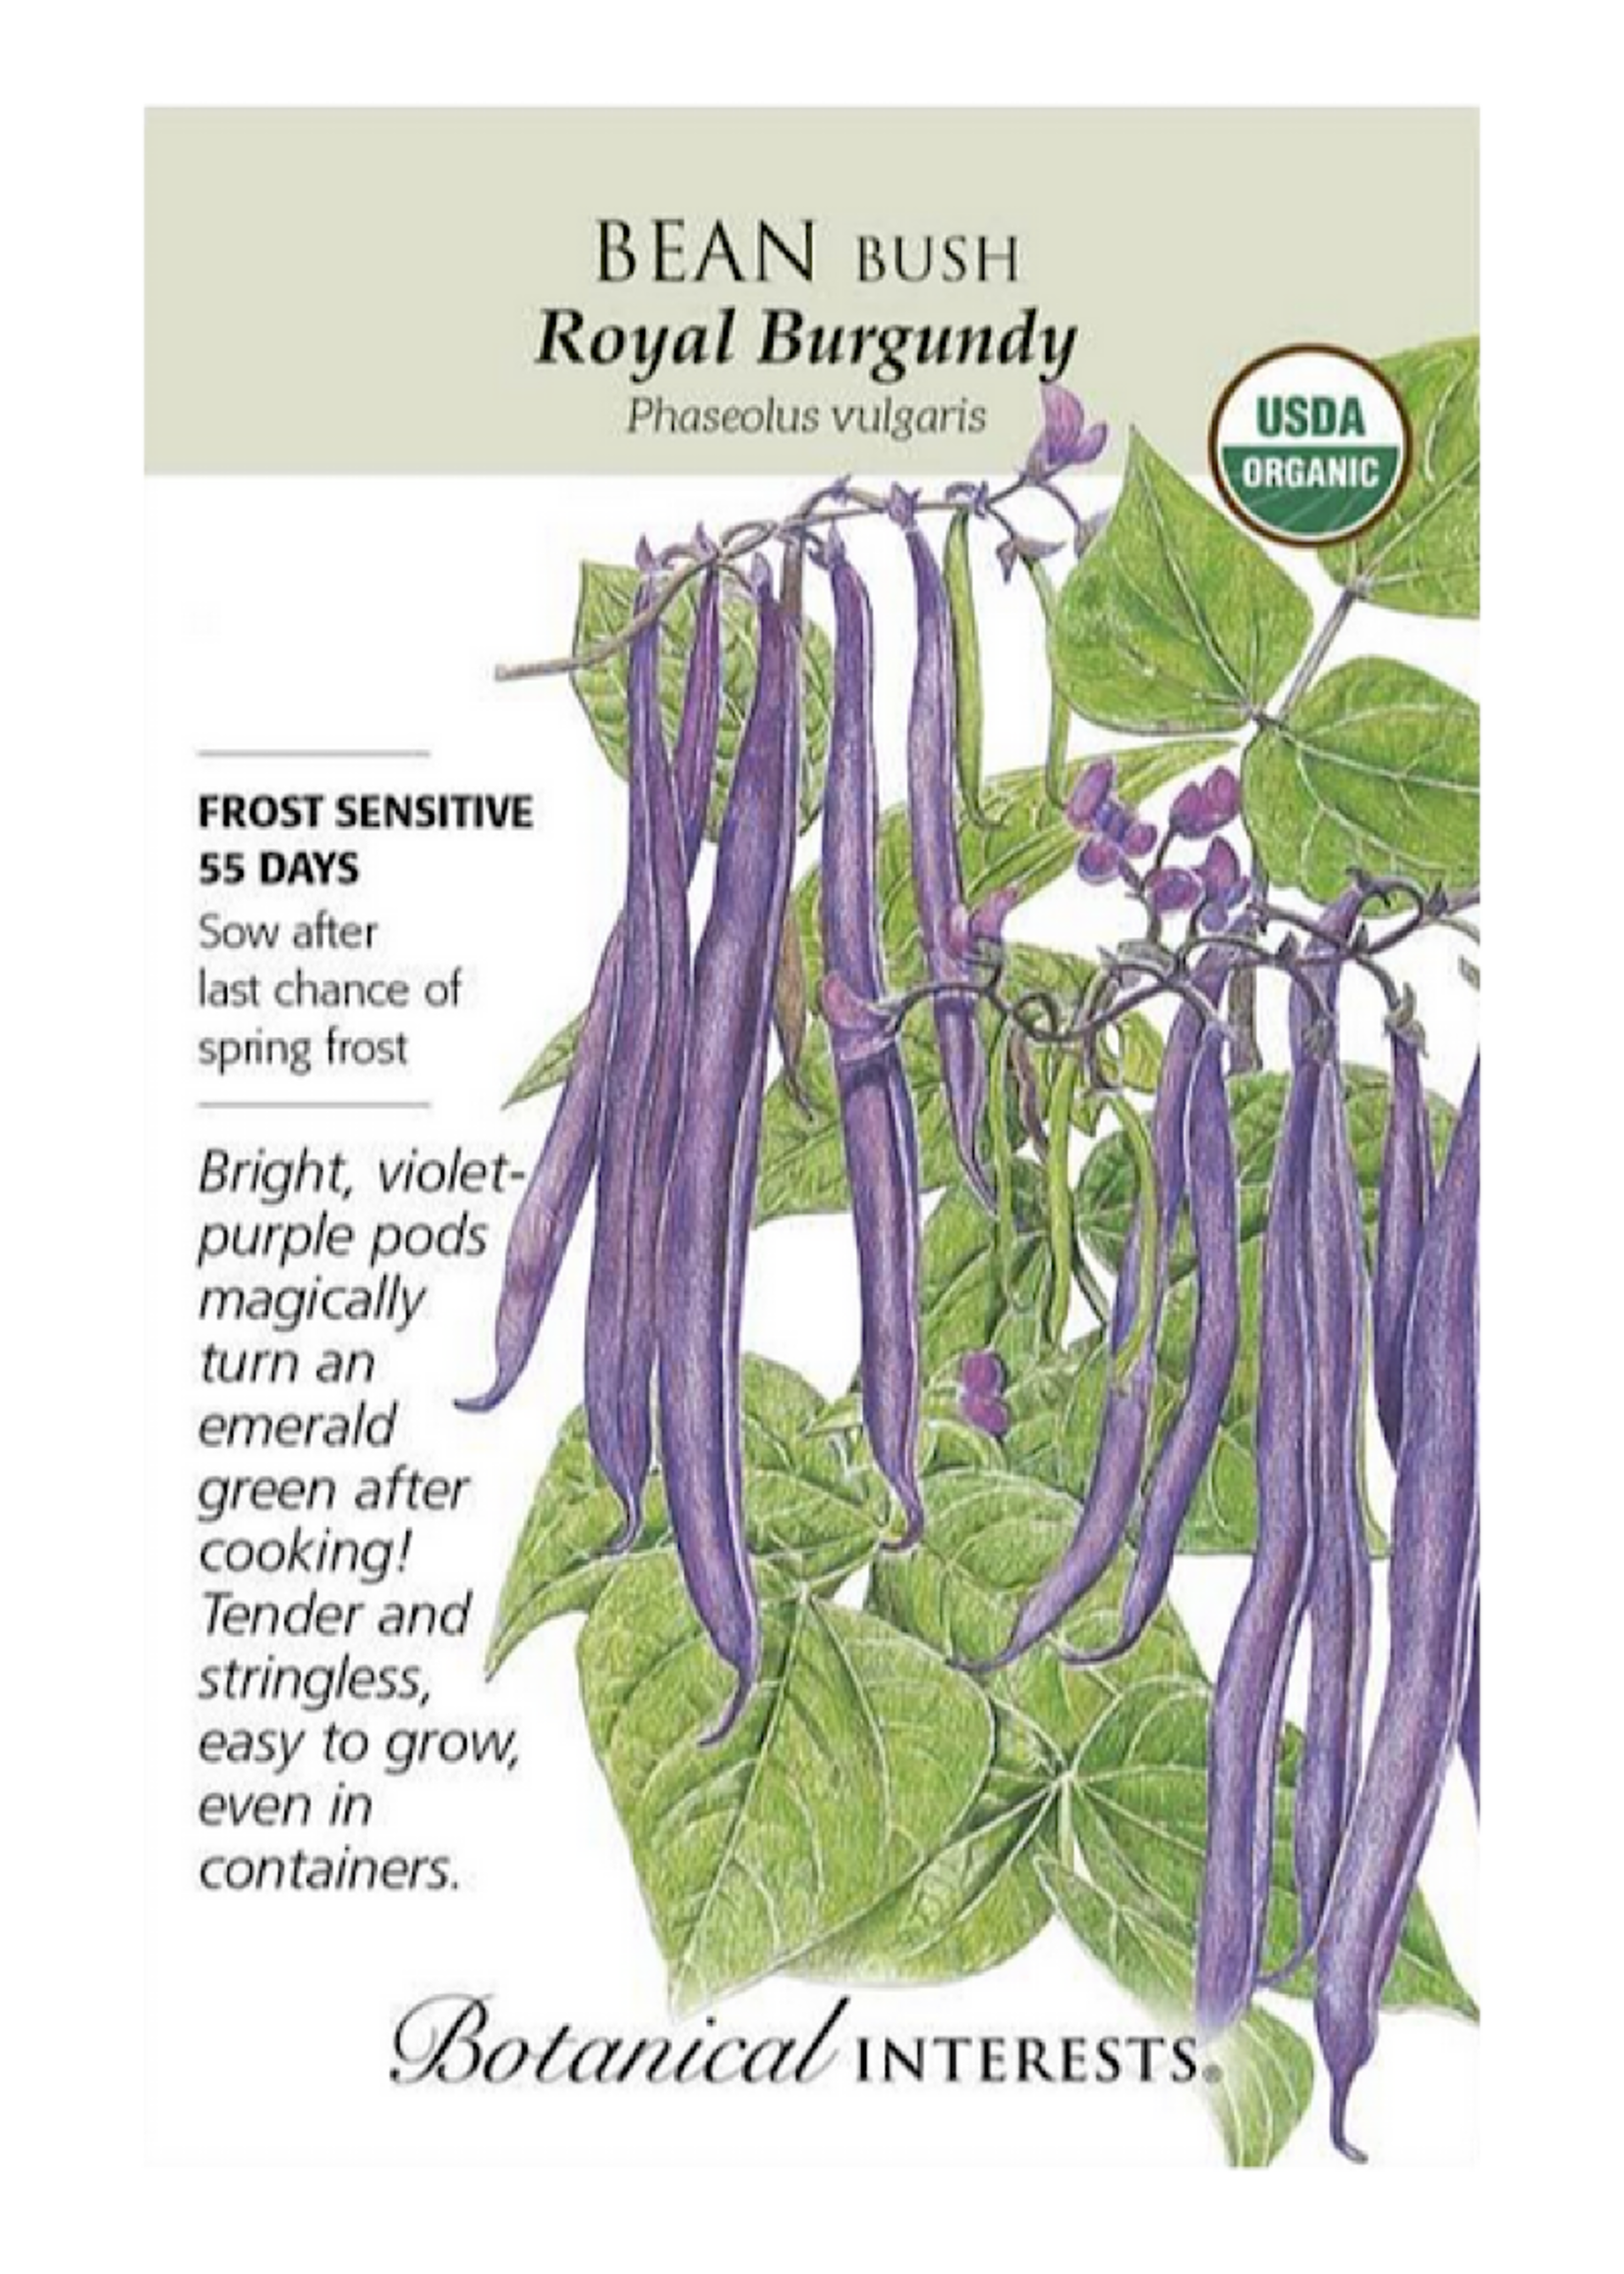 Bean Bush 'Royal Burgundy' Seed Pack